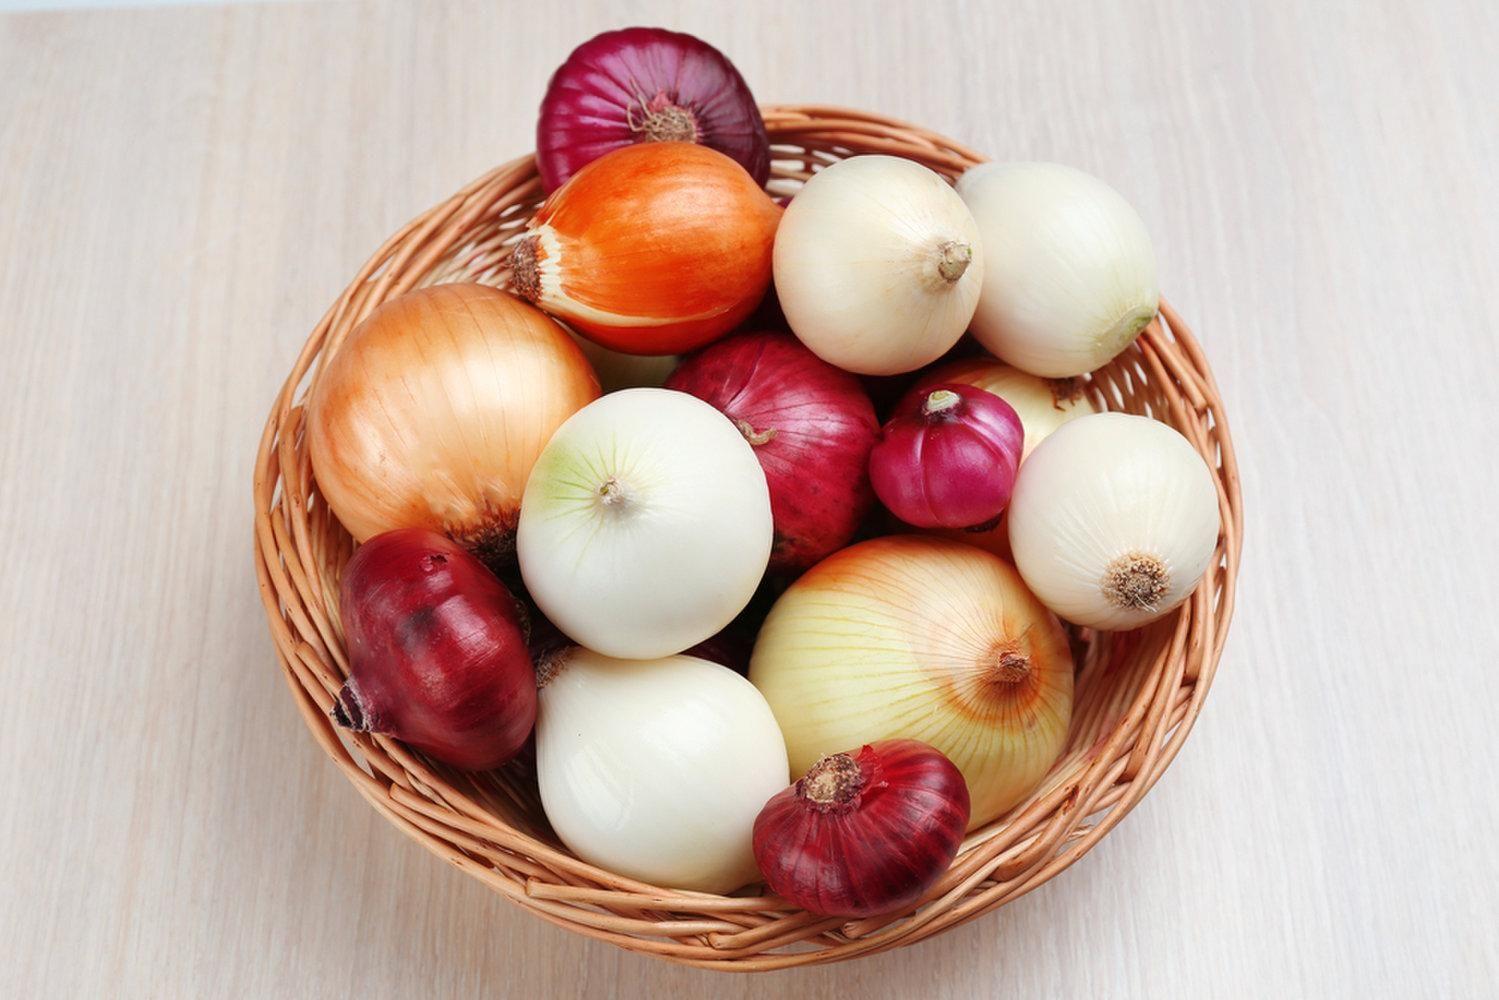 Onions Insulin Resistance